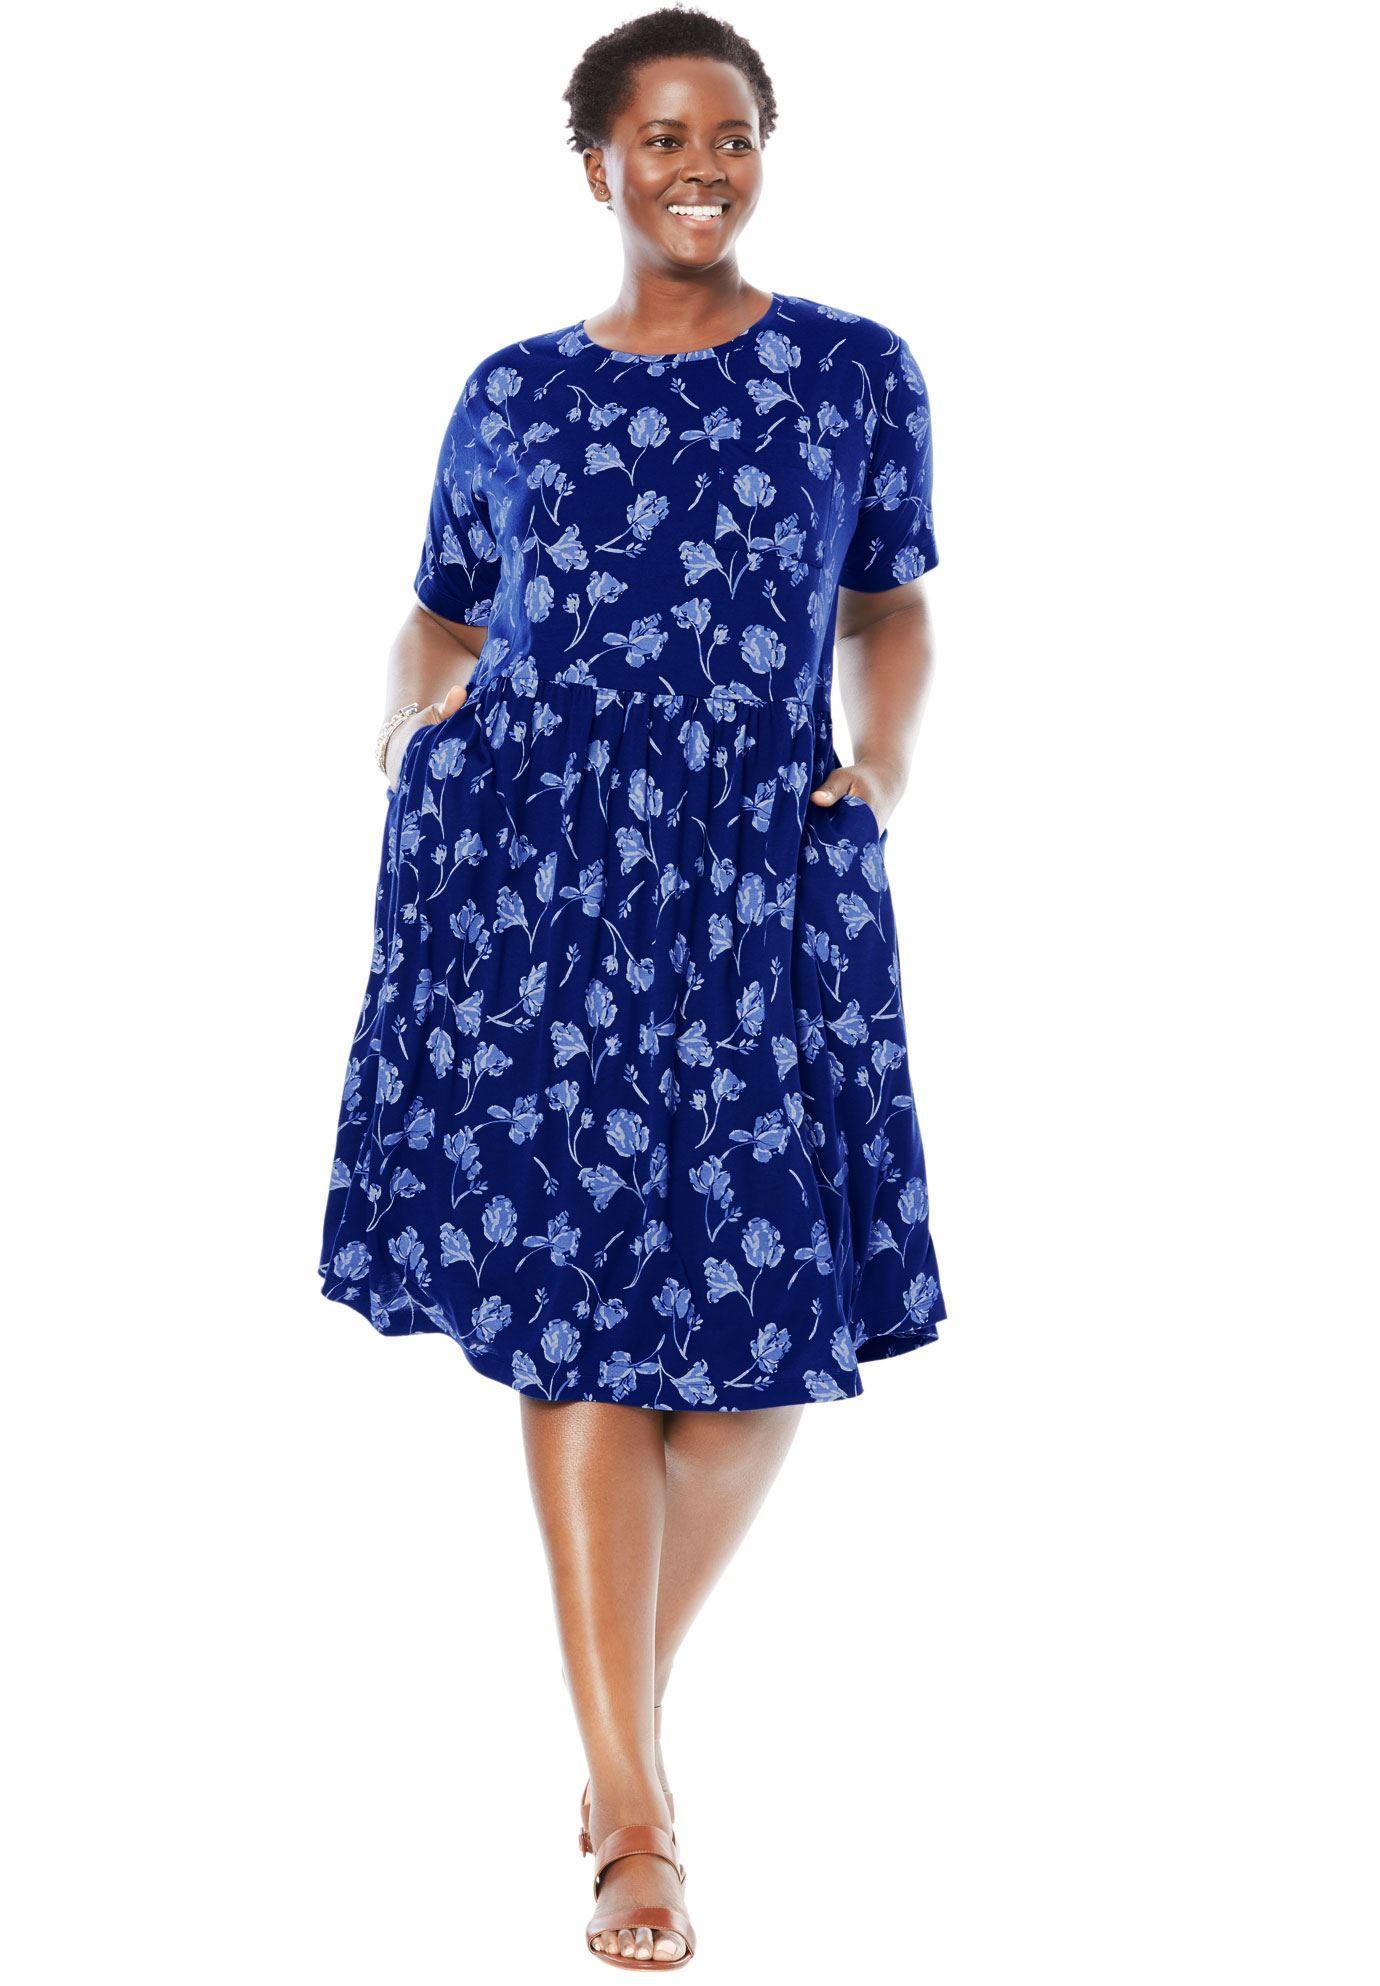 075191495ec Flounce Tee Dress - Women s Plus Size Clothing